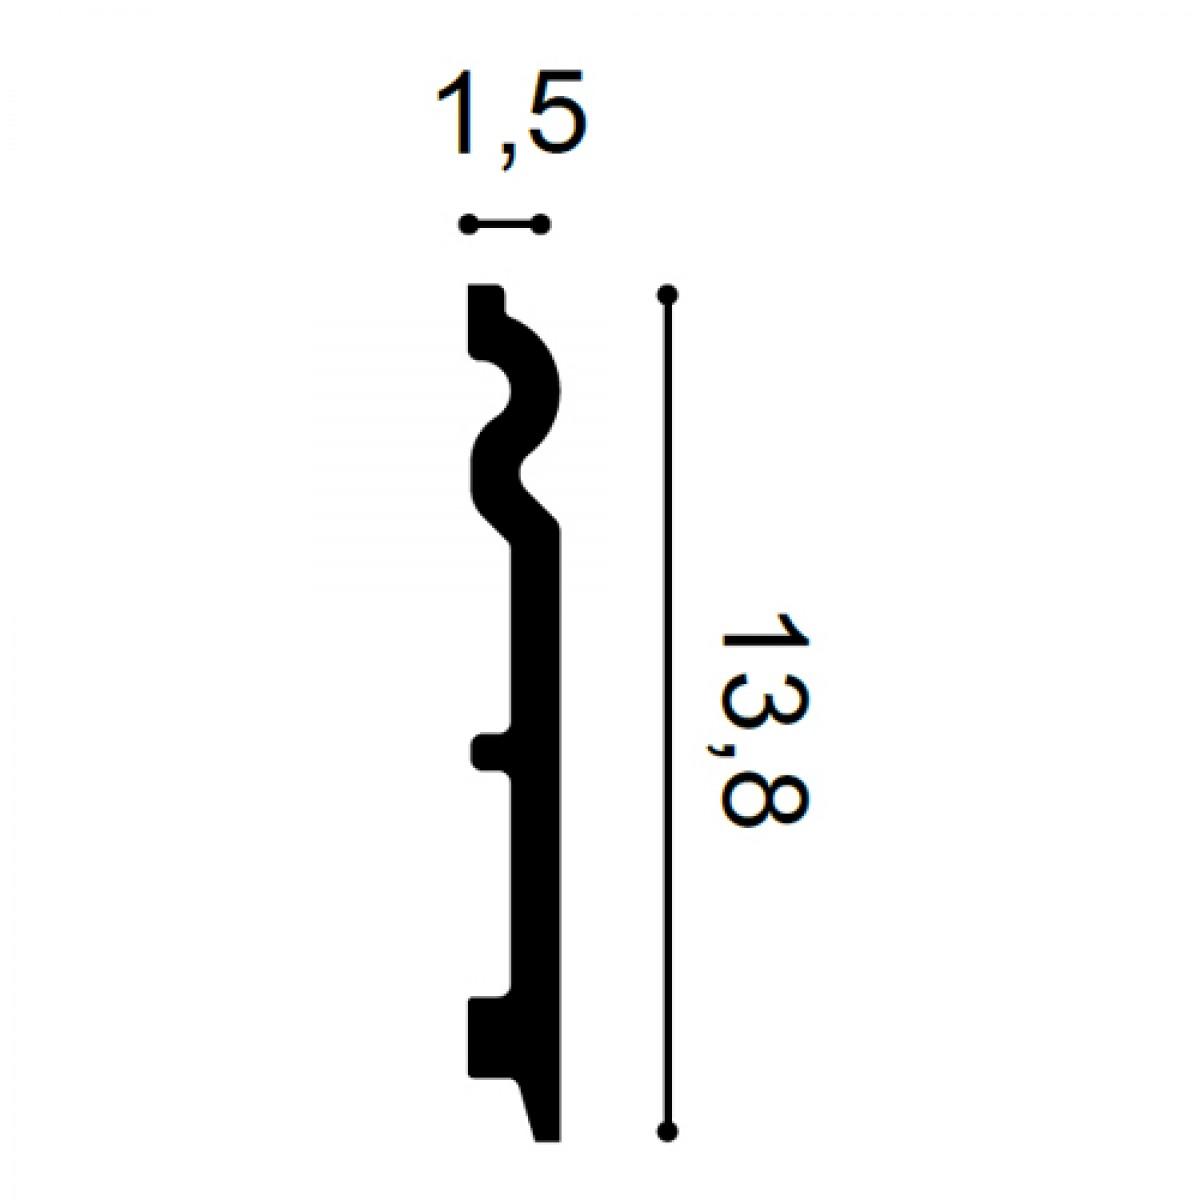 Plinta Flex Axxent SX138F, Dimensiuni: 200 X 1.5 X 13.8 cm, Orac Decor